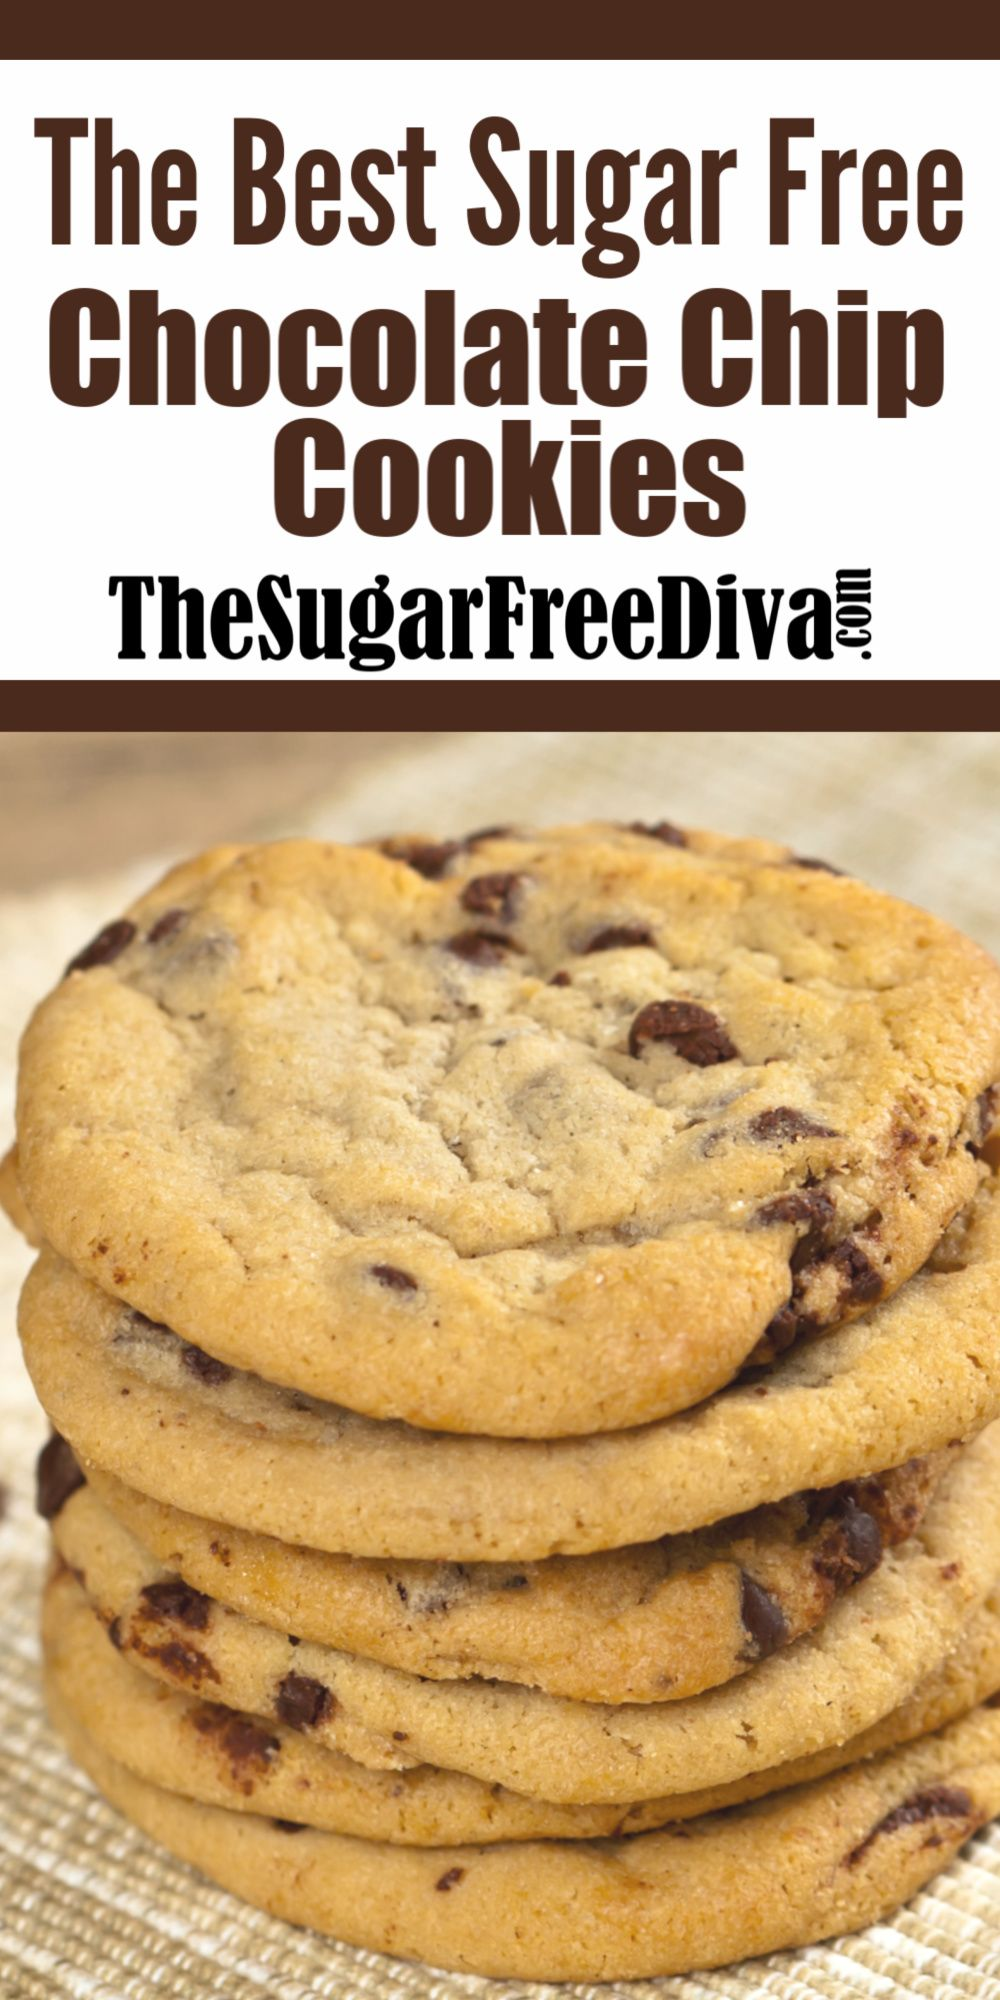 YUM! The Best Sugar Free Chocolate Chip Cookies!